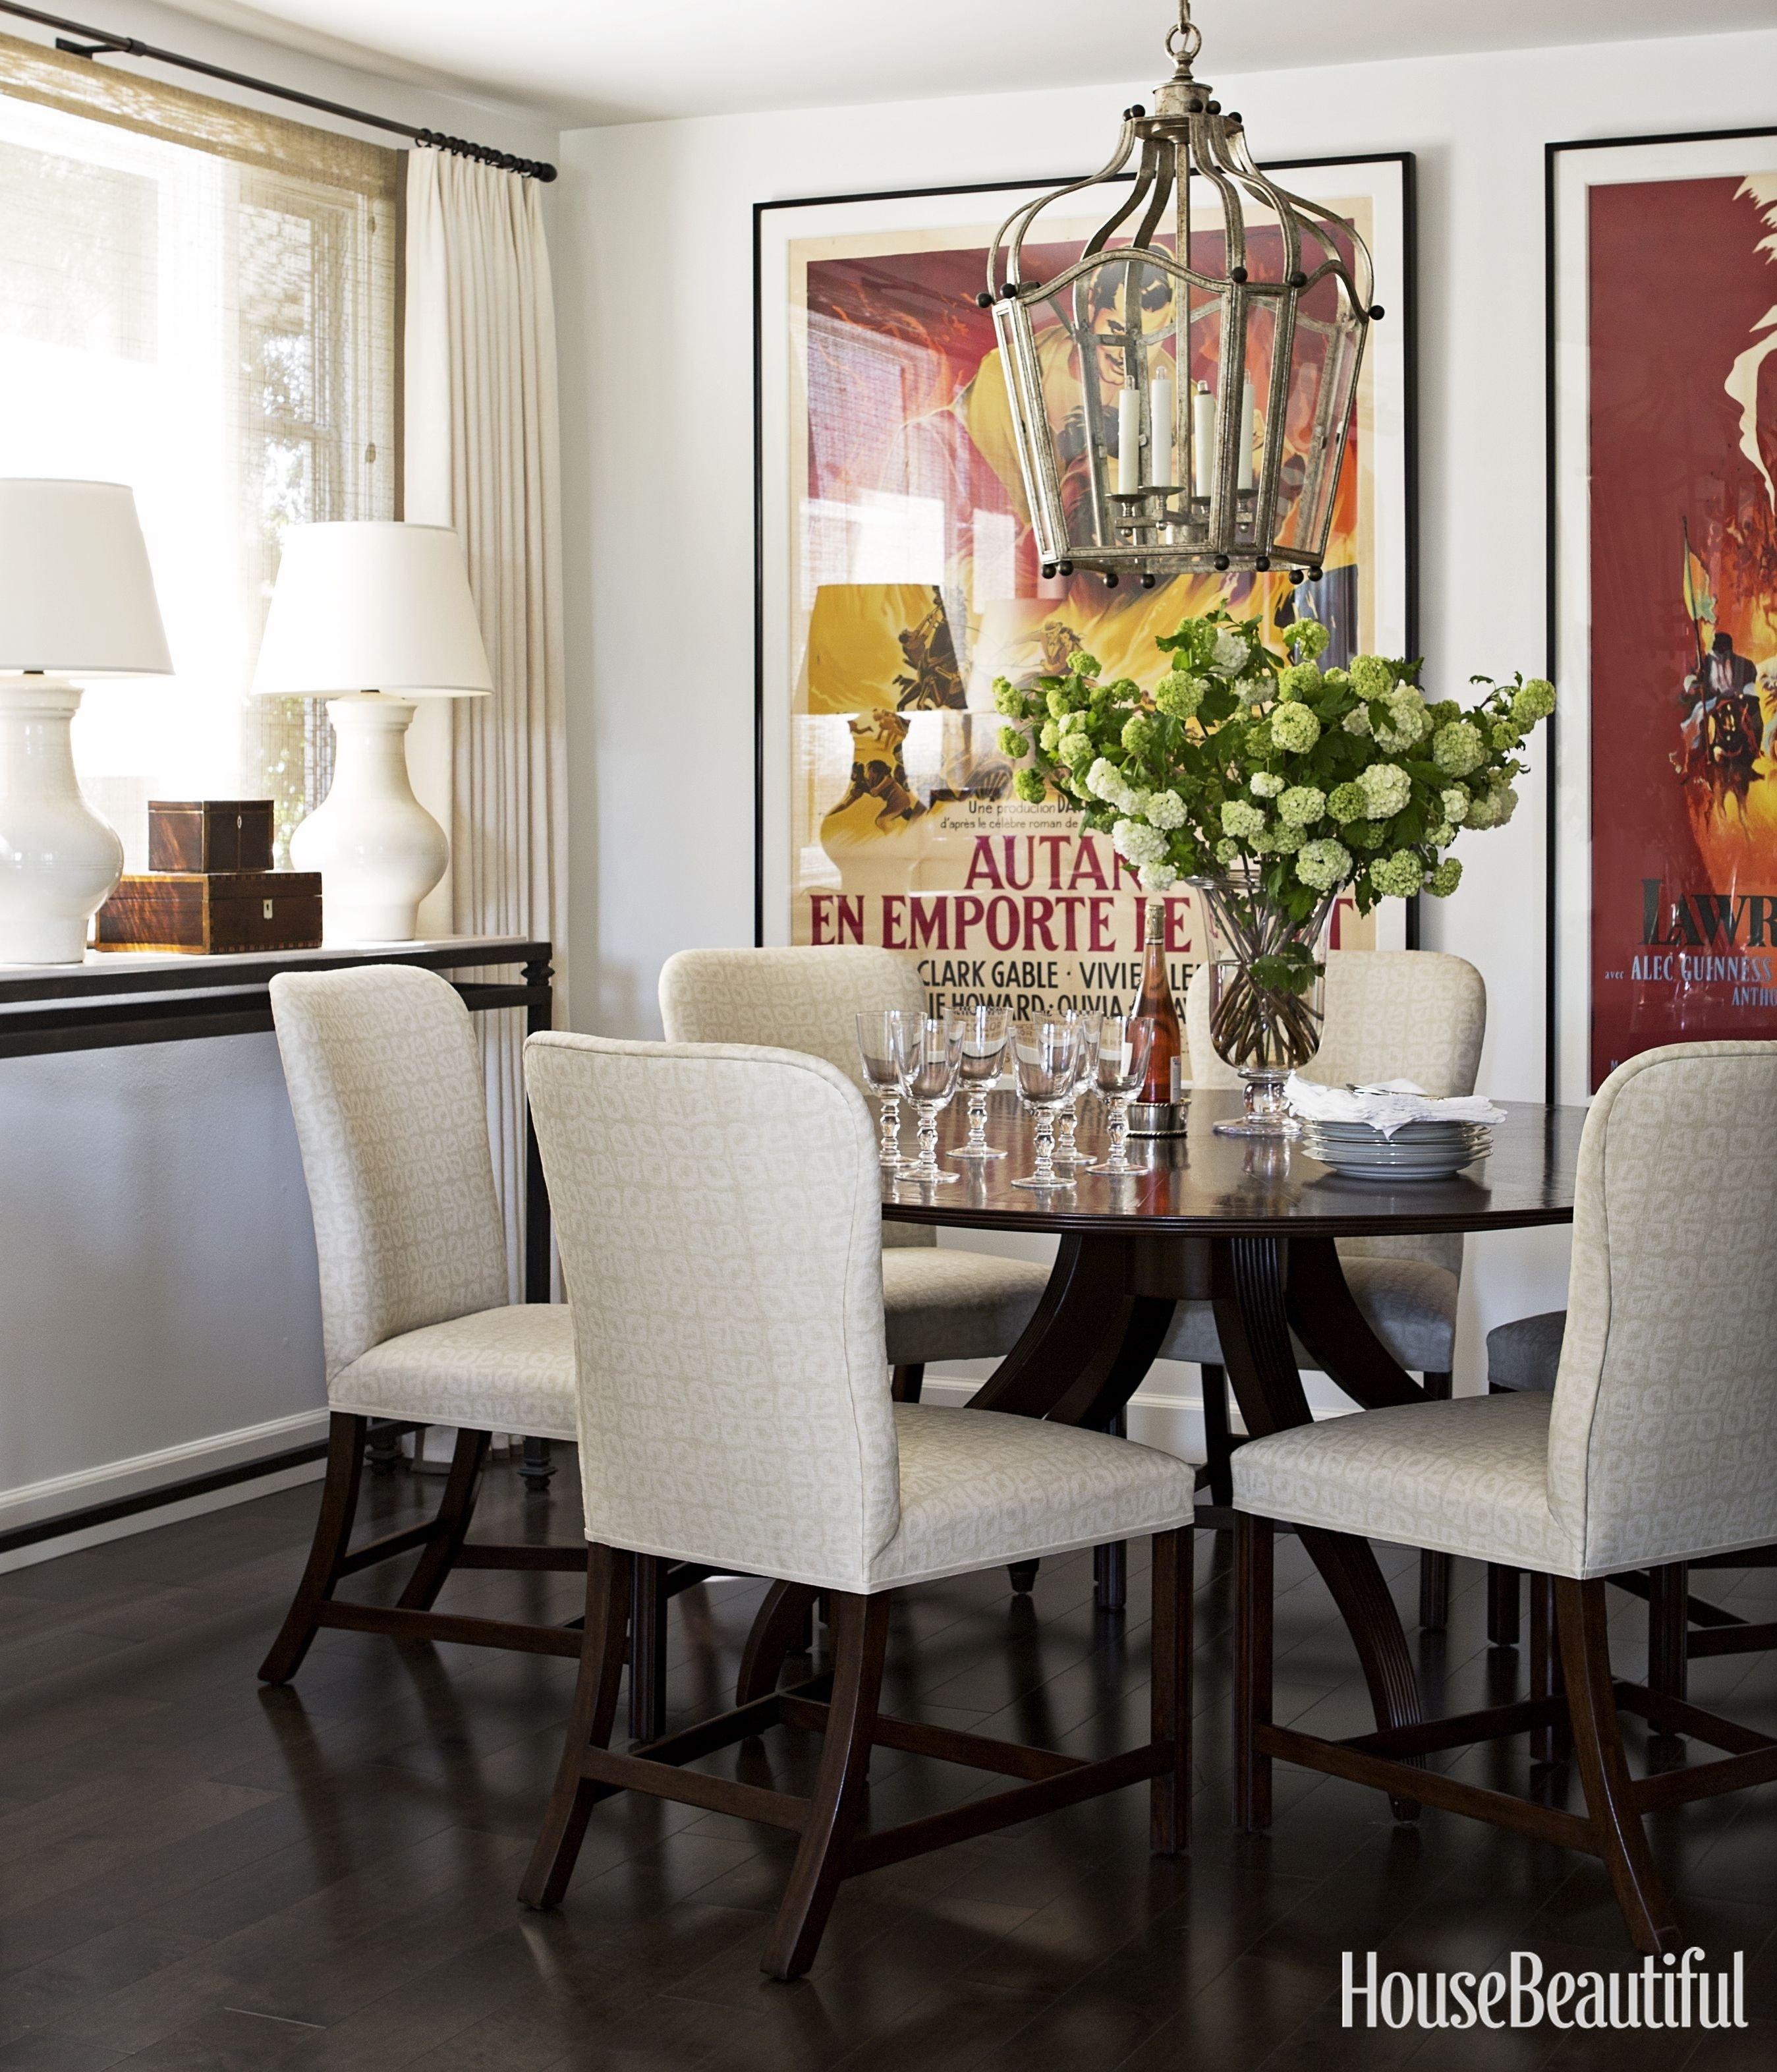 10 Elegant Dining Room Table Decorating Ideas Pictures 85 best dining room decorating ideas and pictures 1